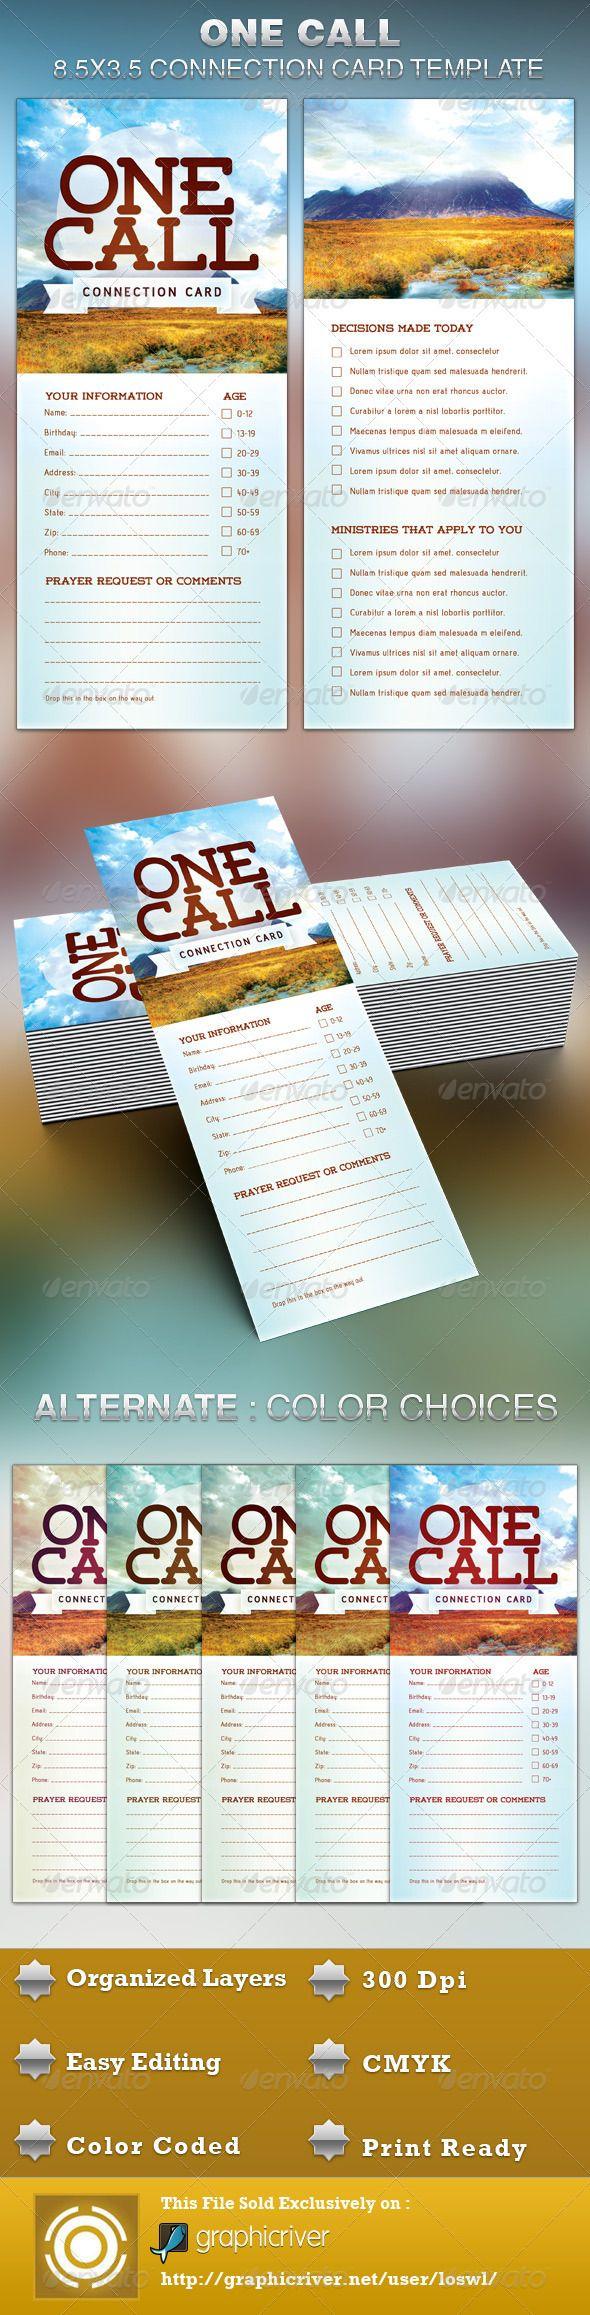 One Call Church Connection Card Template by Mark Taylor, via Behance